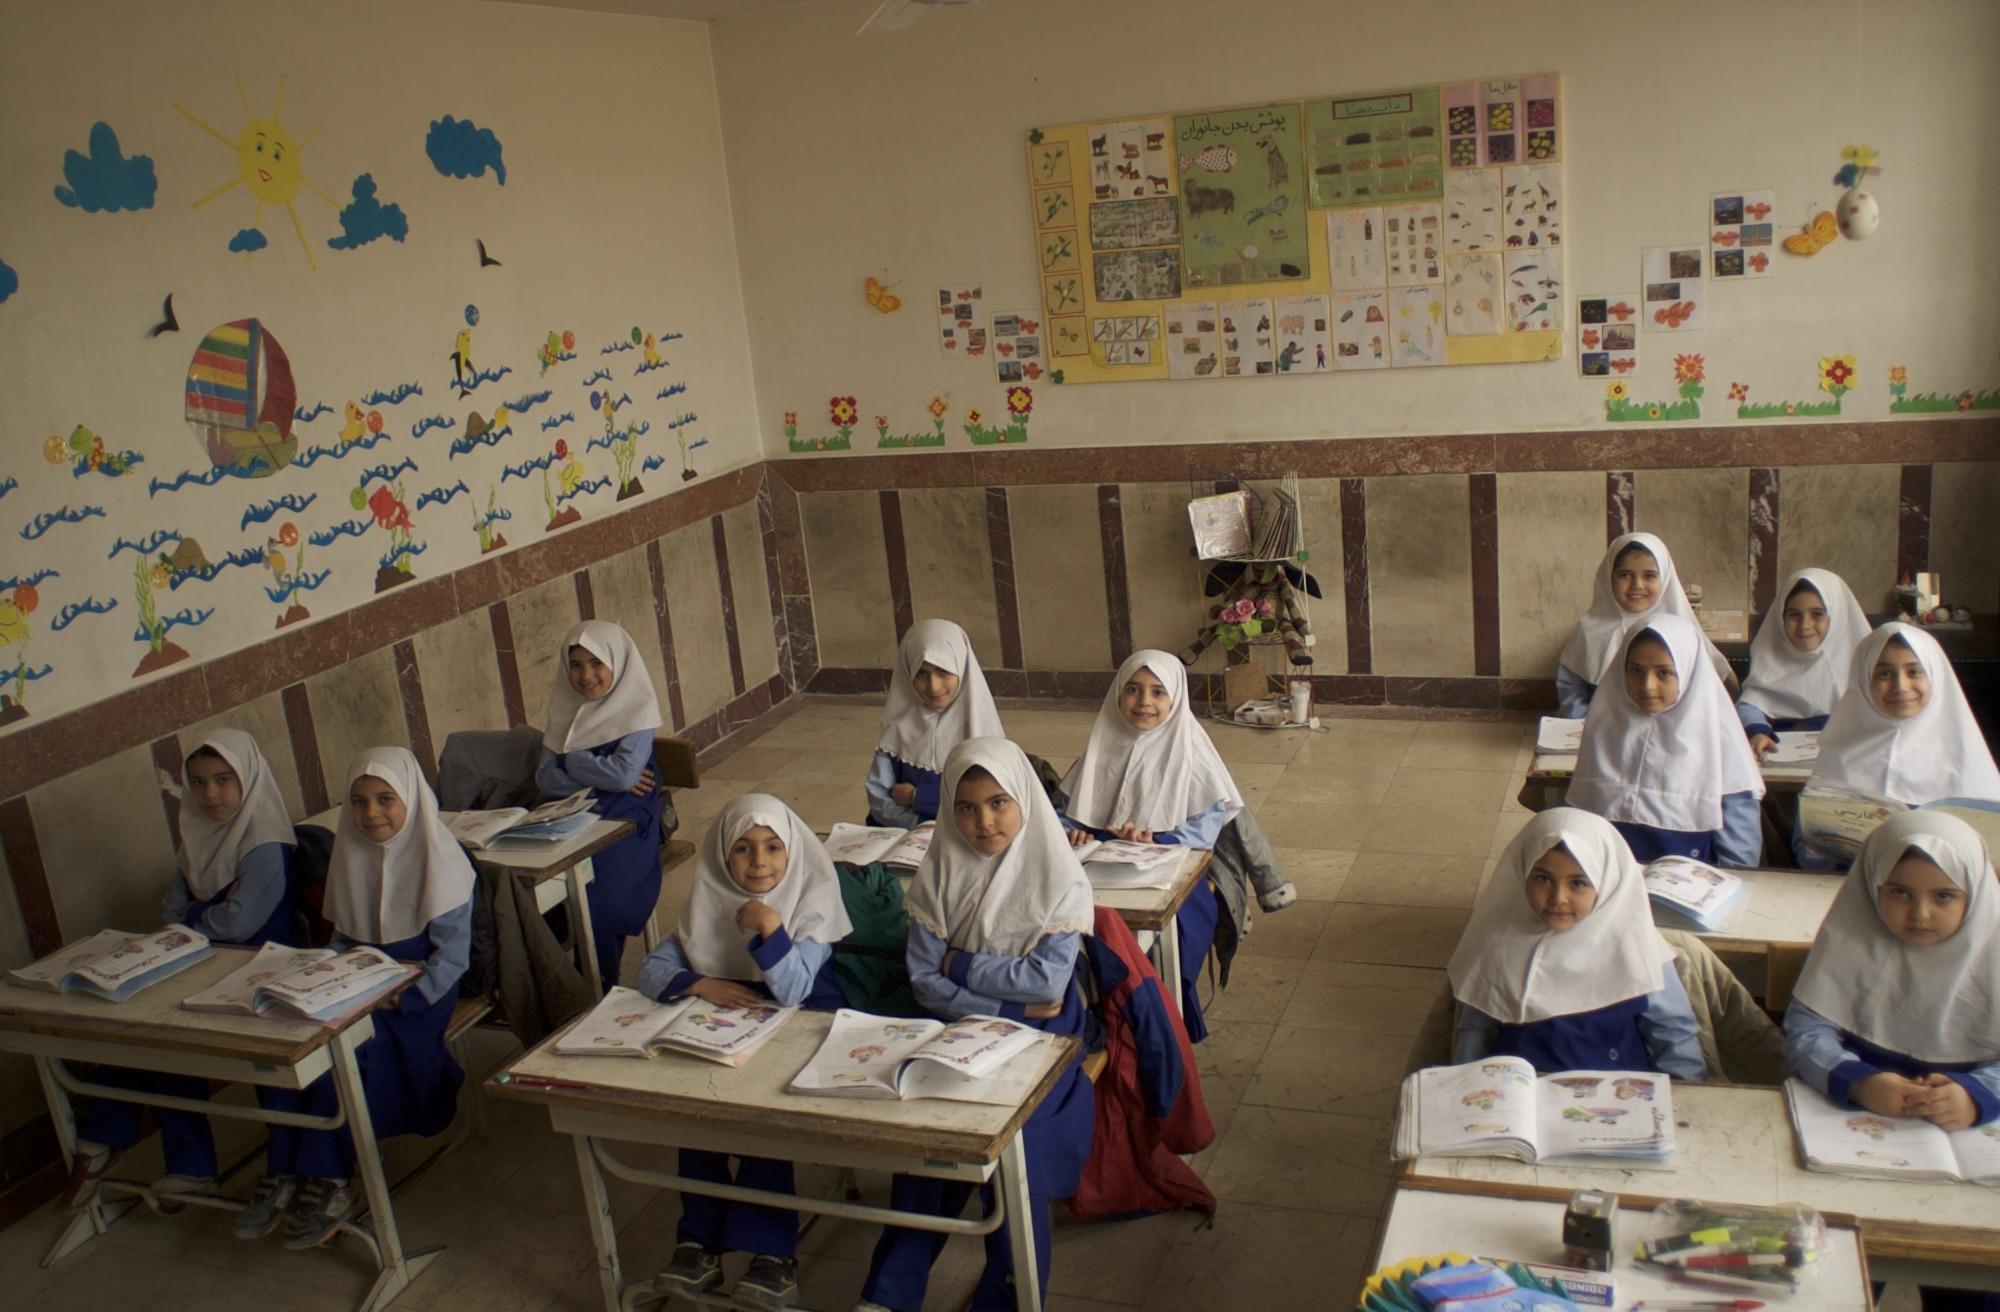 Gol Tappeh School